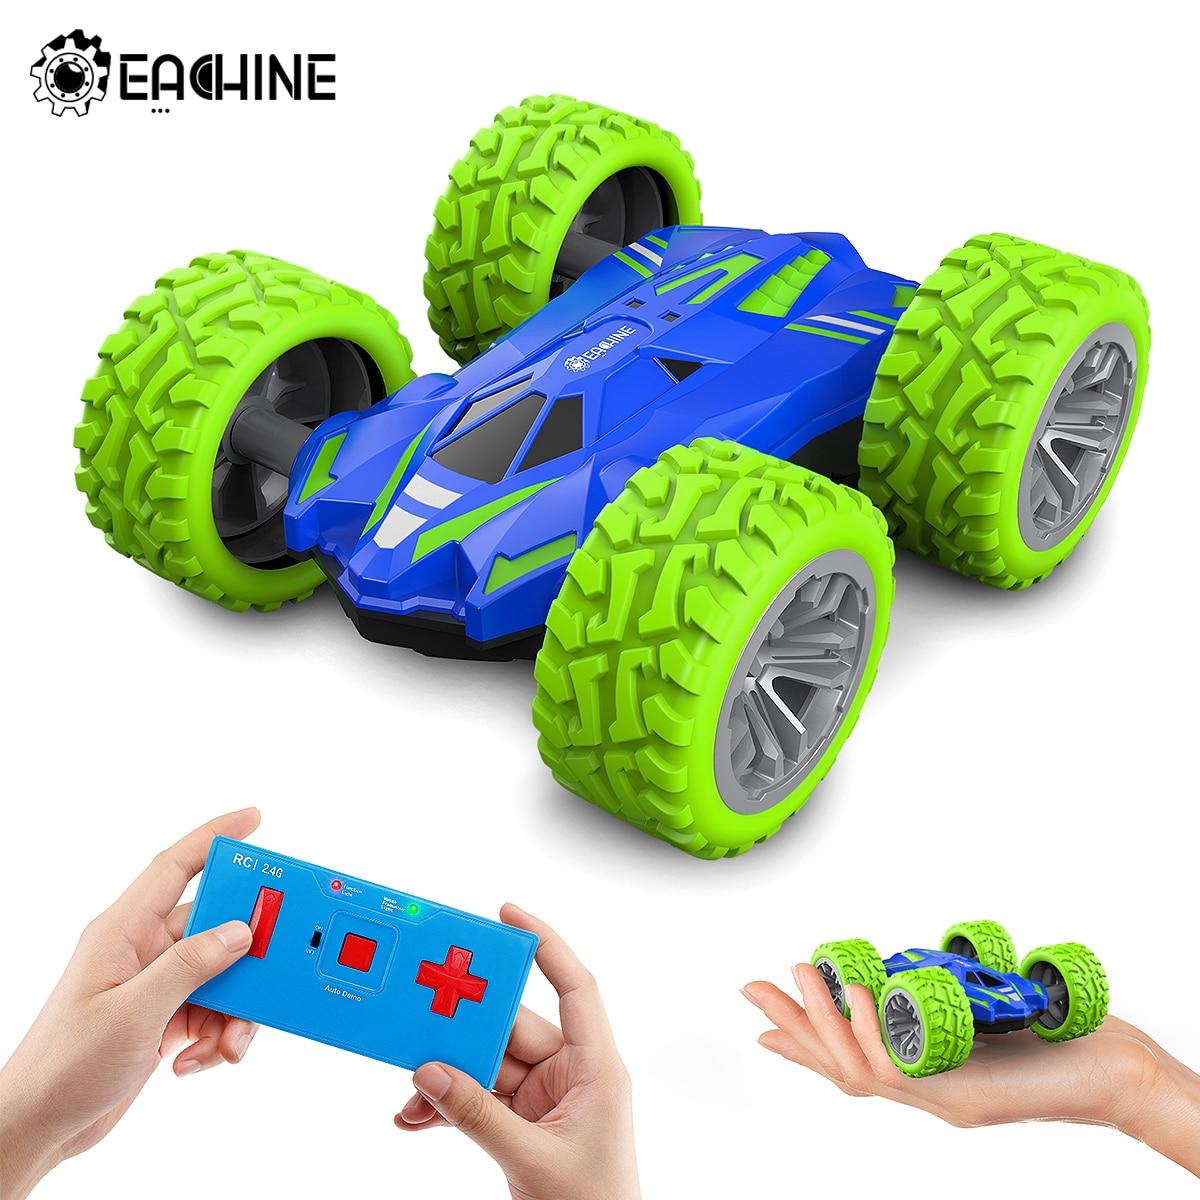 Everyine-سيارة لعبة يتم التحكم فيها عن بعد للأطفال ، سيارة تحكم عن بعد مع تشوه بهلواني ، 2.4G ، 4 قنوات ، زاحف الصخور